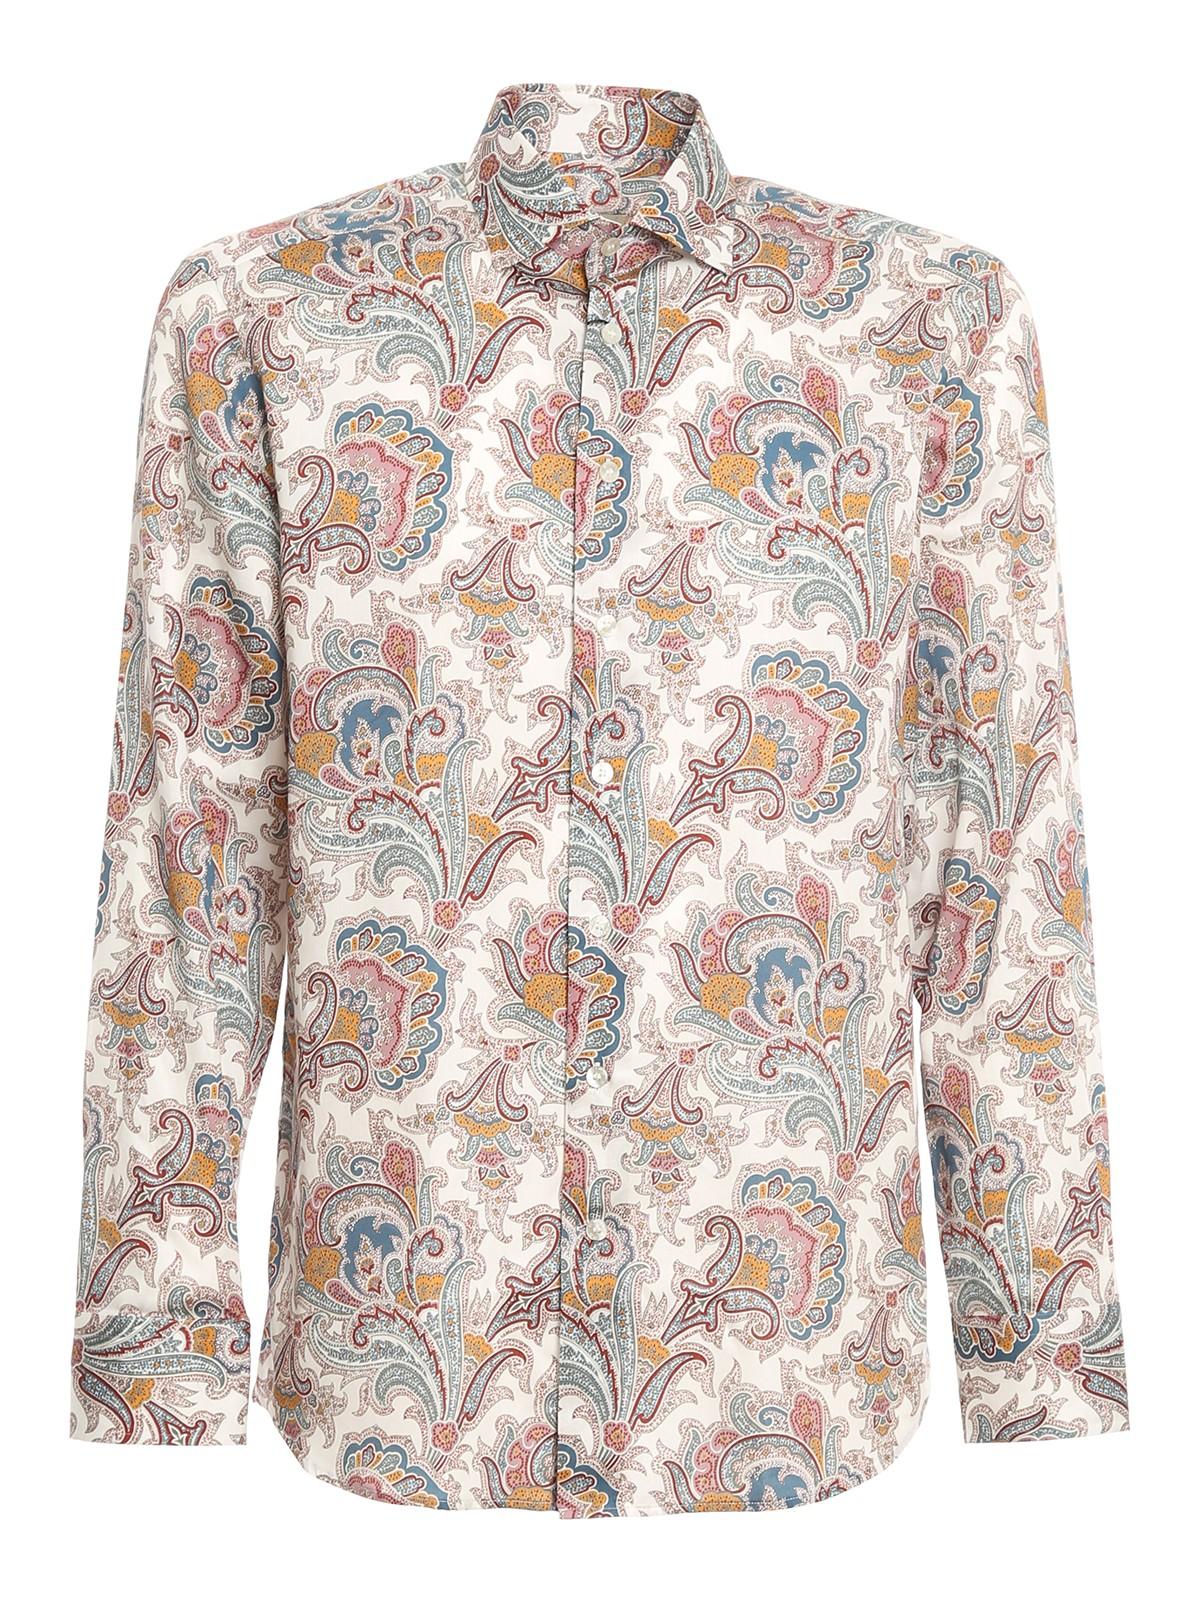 Etro Cottons PAISLY COTTON SHIRT